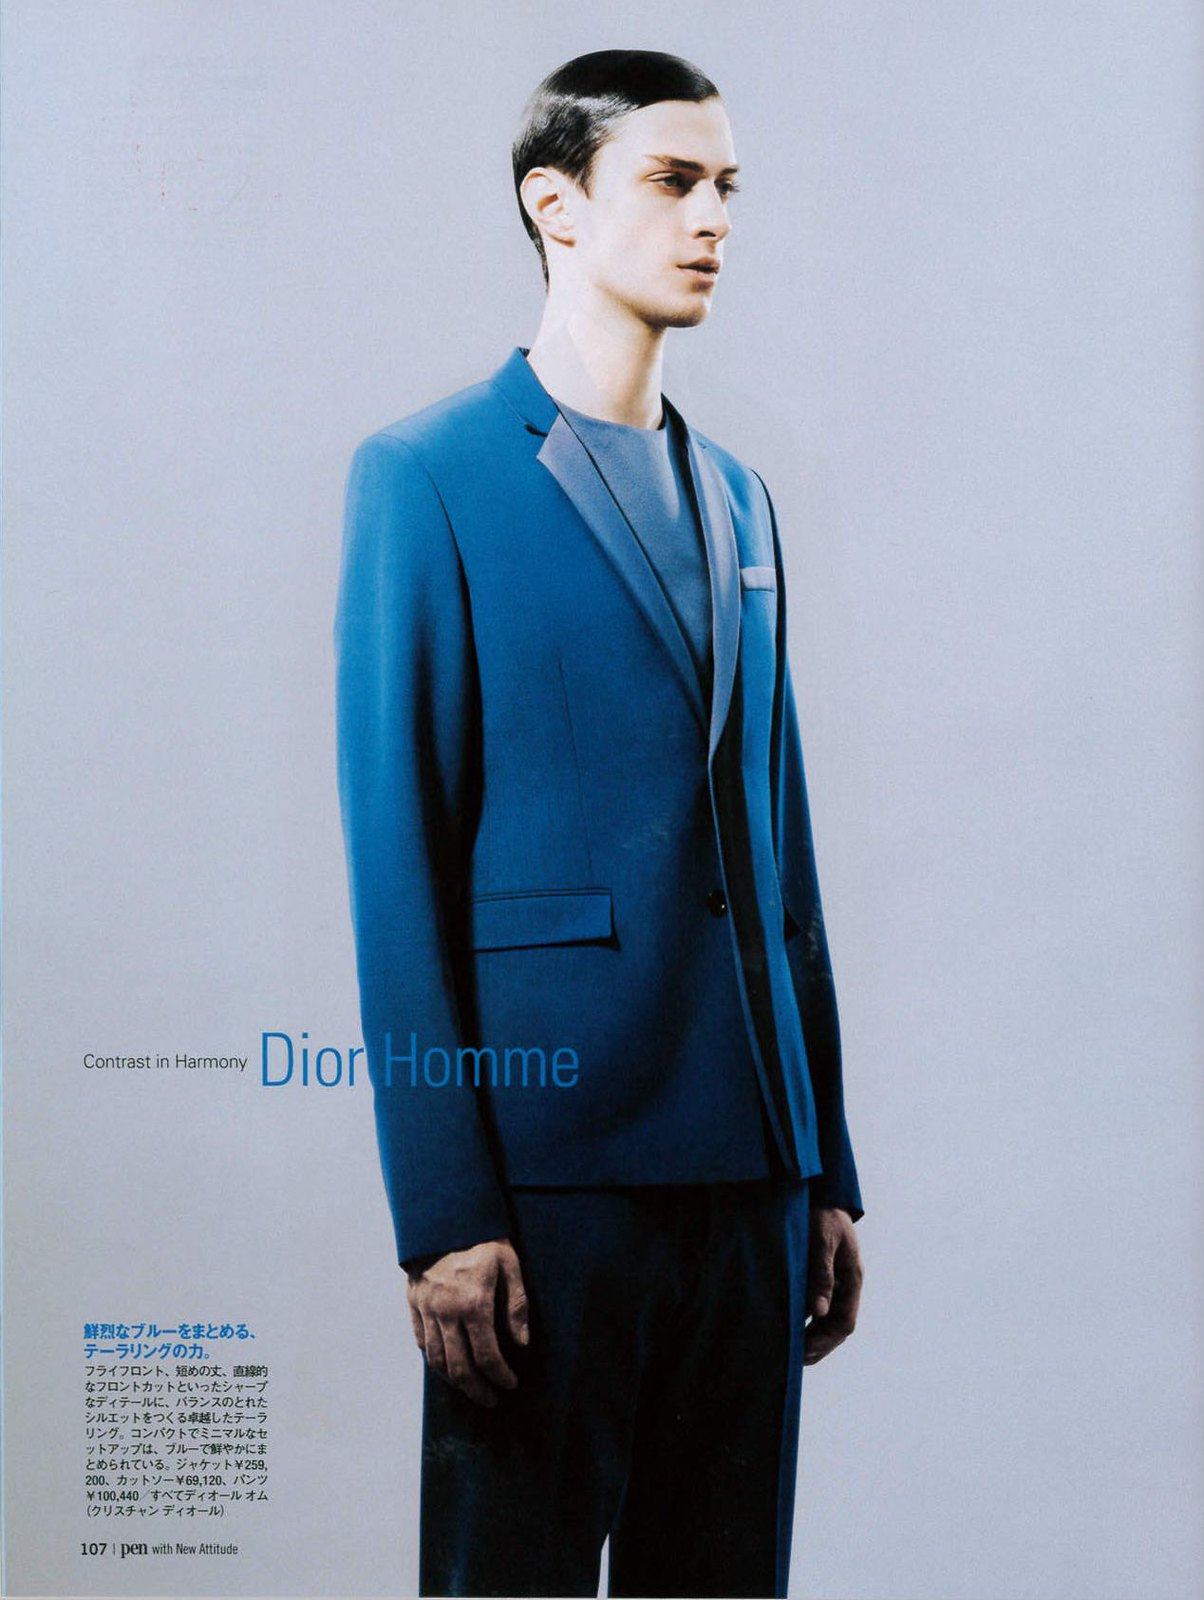 Matthew Bell0058_pen No.358 Dior Homme(super sonic)